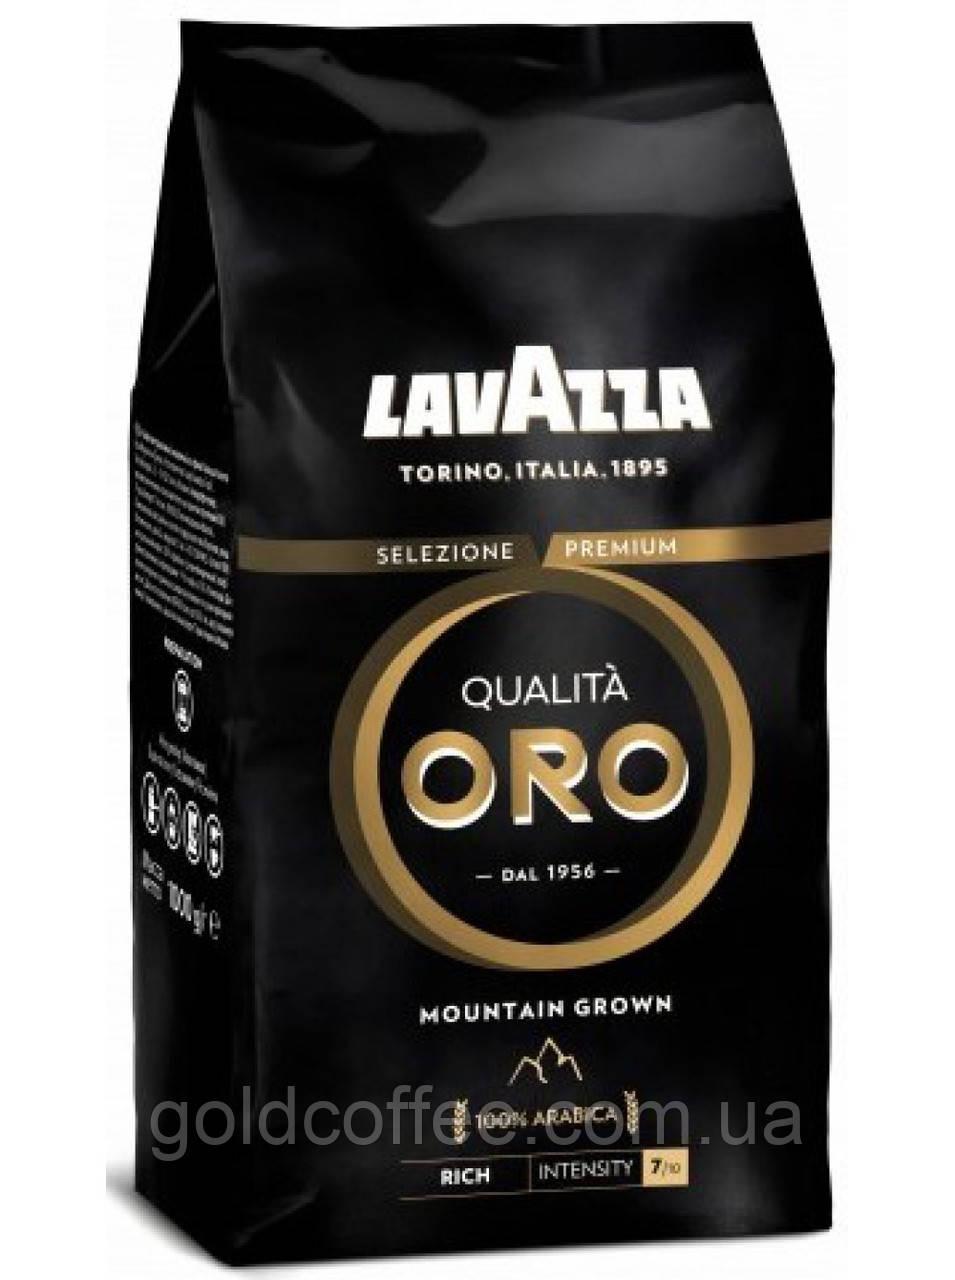 Зернова кава LavAzza Qualità Oro Mountain Grown